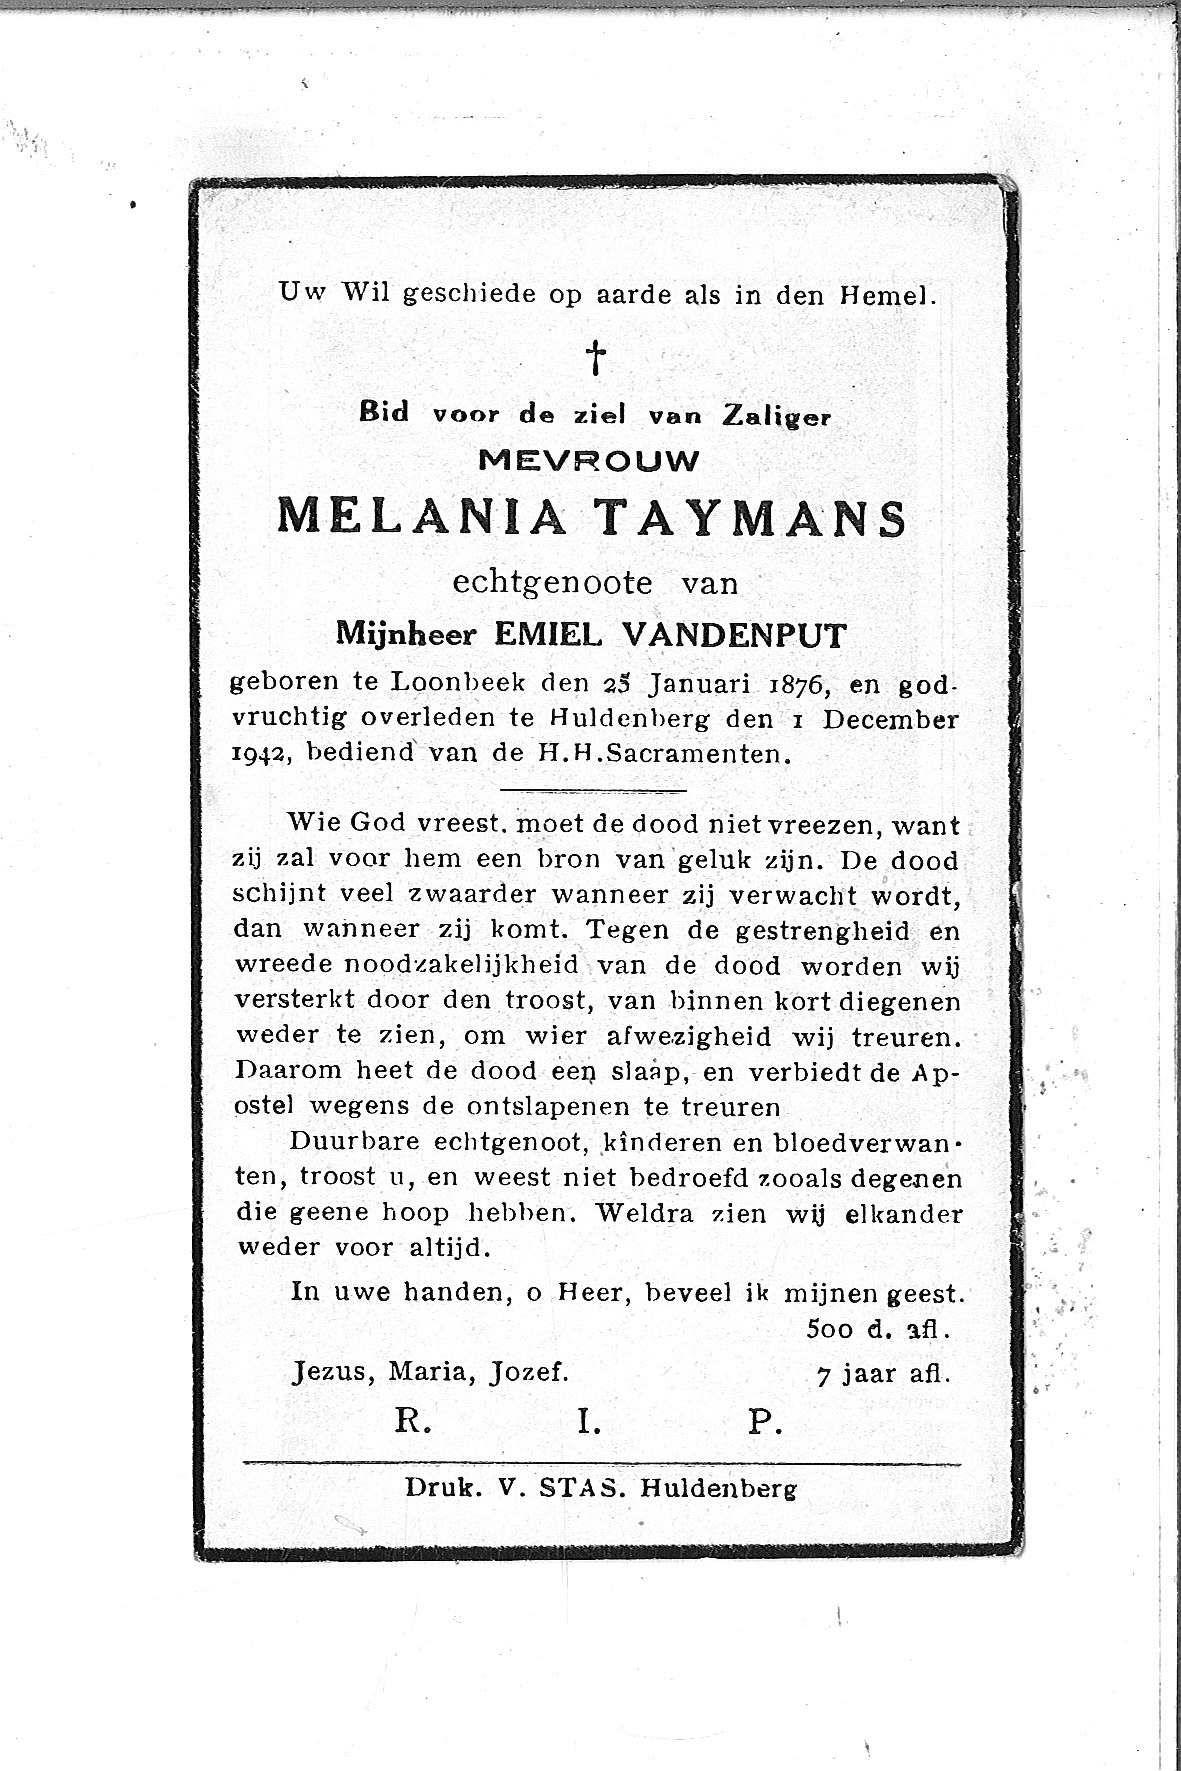 Melania(1942)20140730085017_00194.jpg